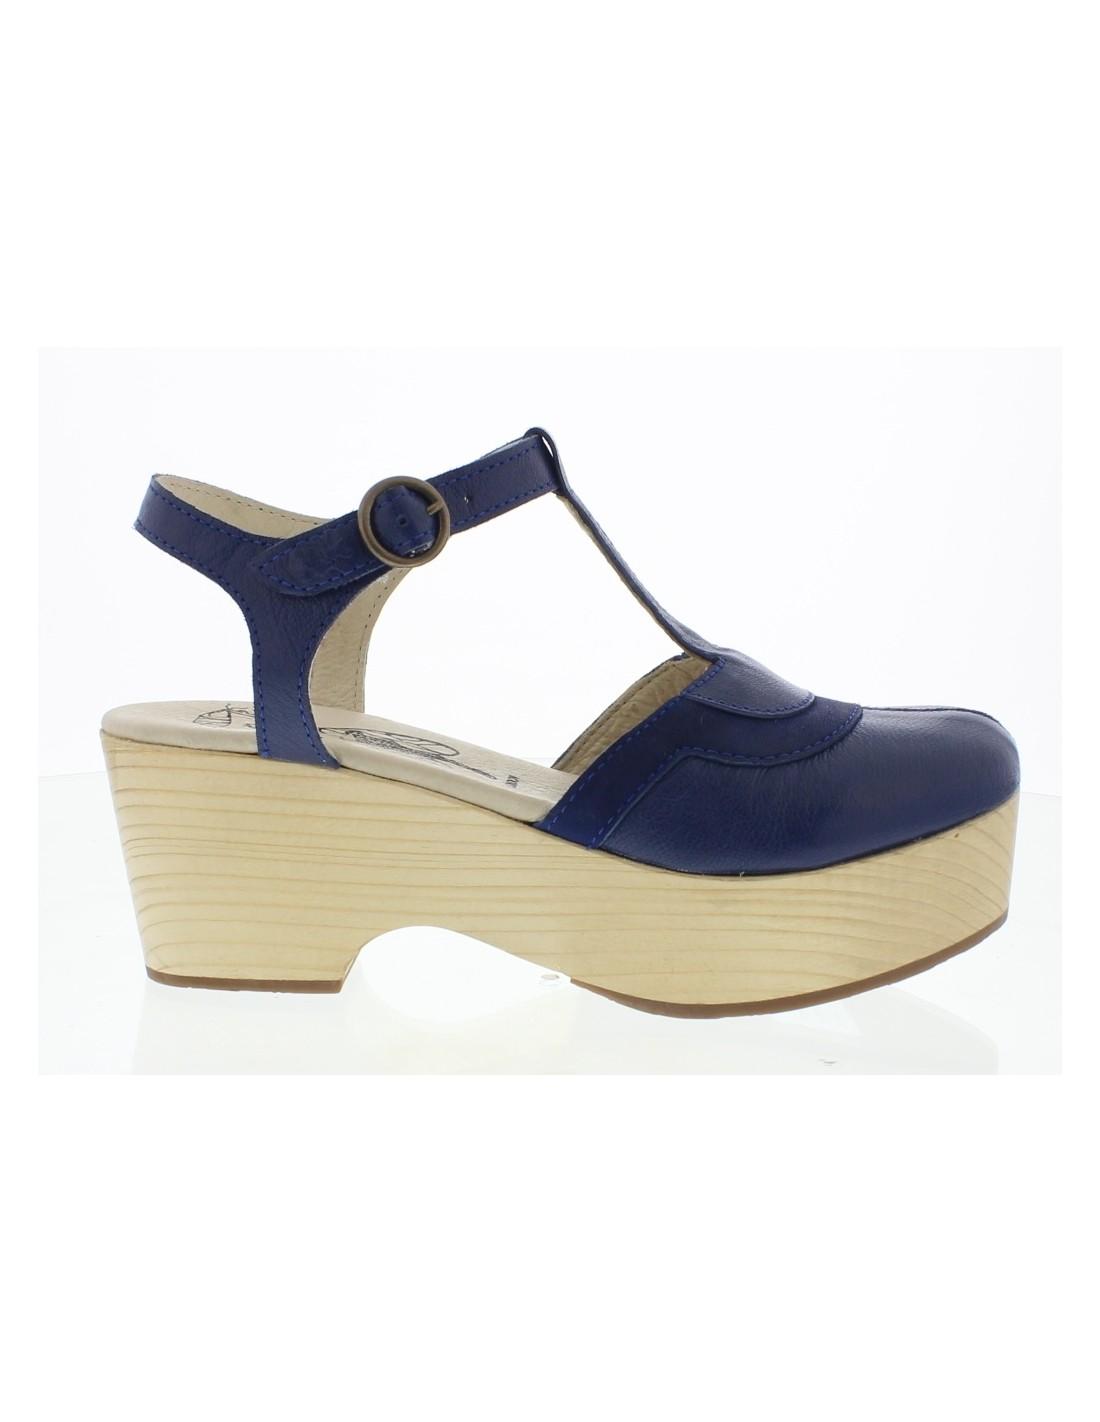 Mujer Qsugvmpz Cuñasandalia Zapato Fly Sandalias Comprar London ZXuPik